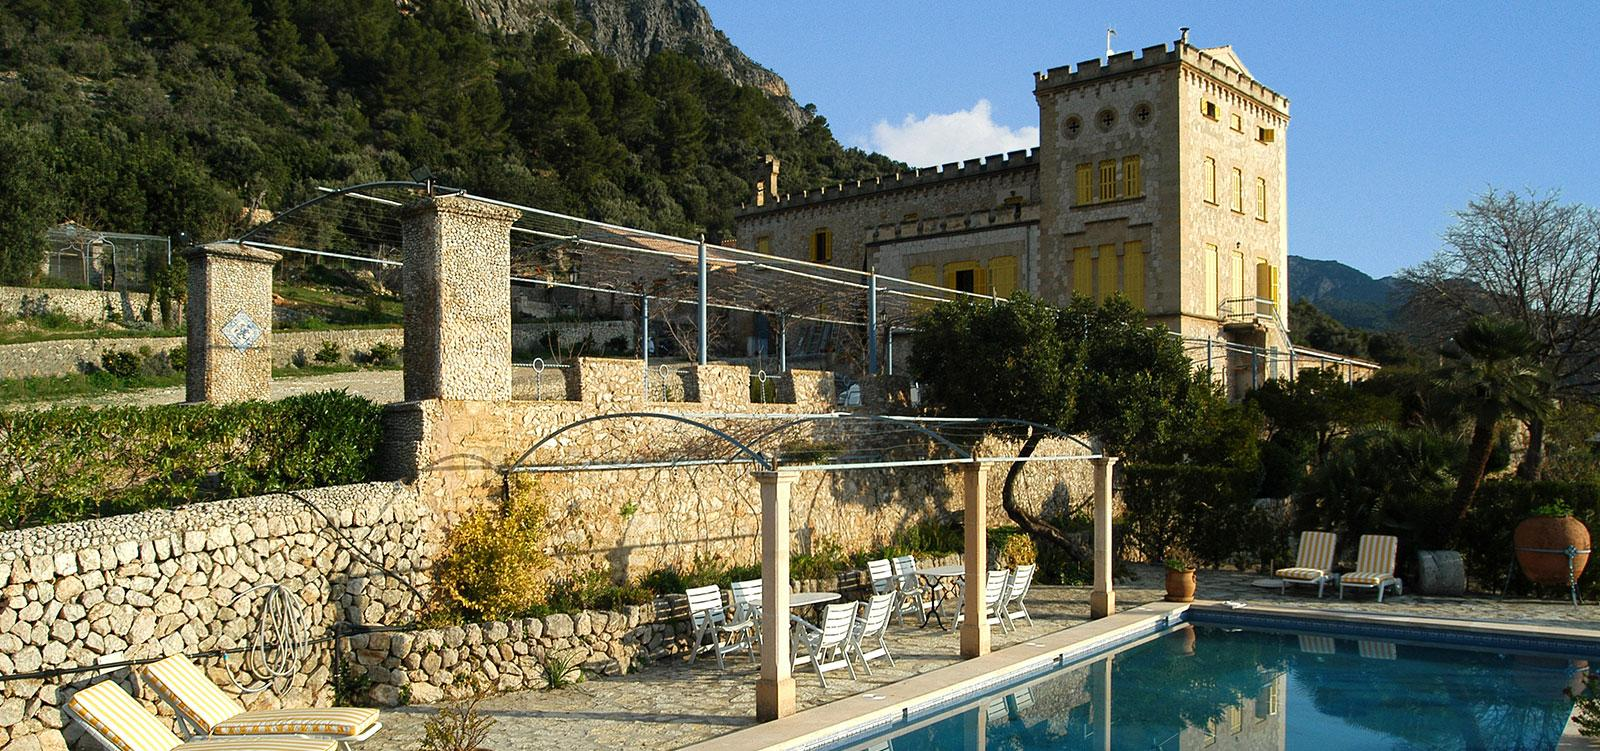 Holidays at Alqueria Blanca Hotel in Bunyola, Majorca